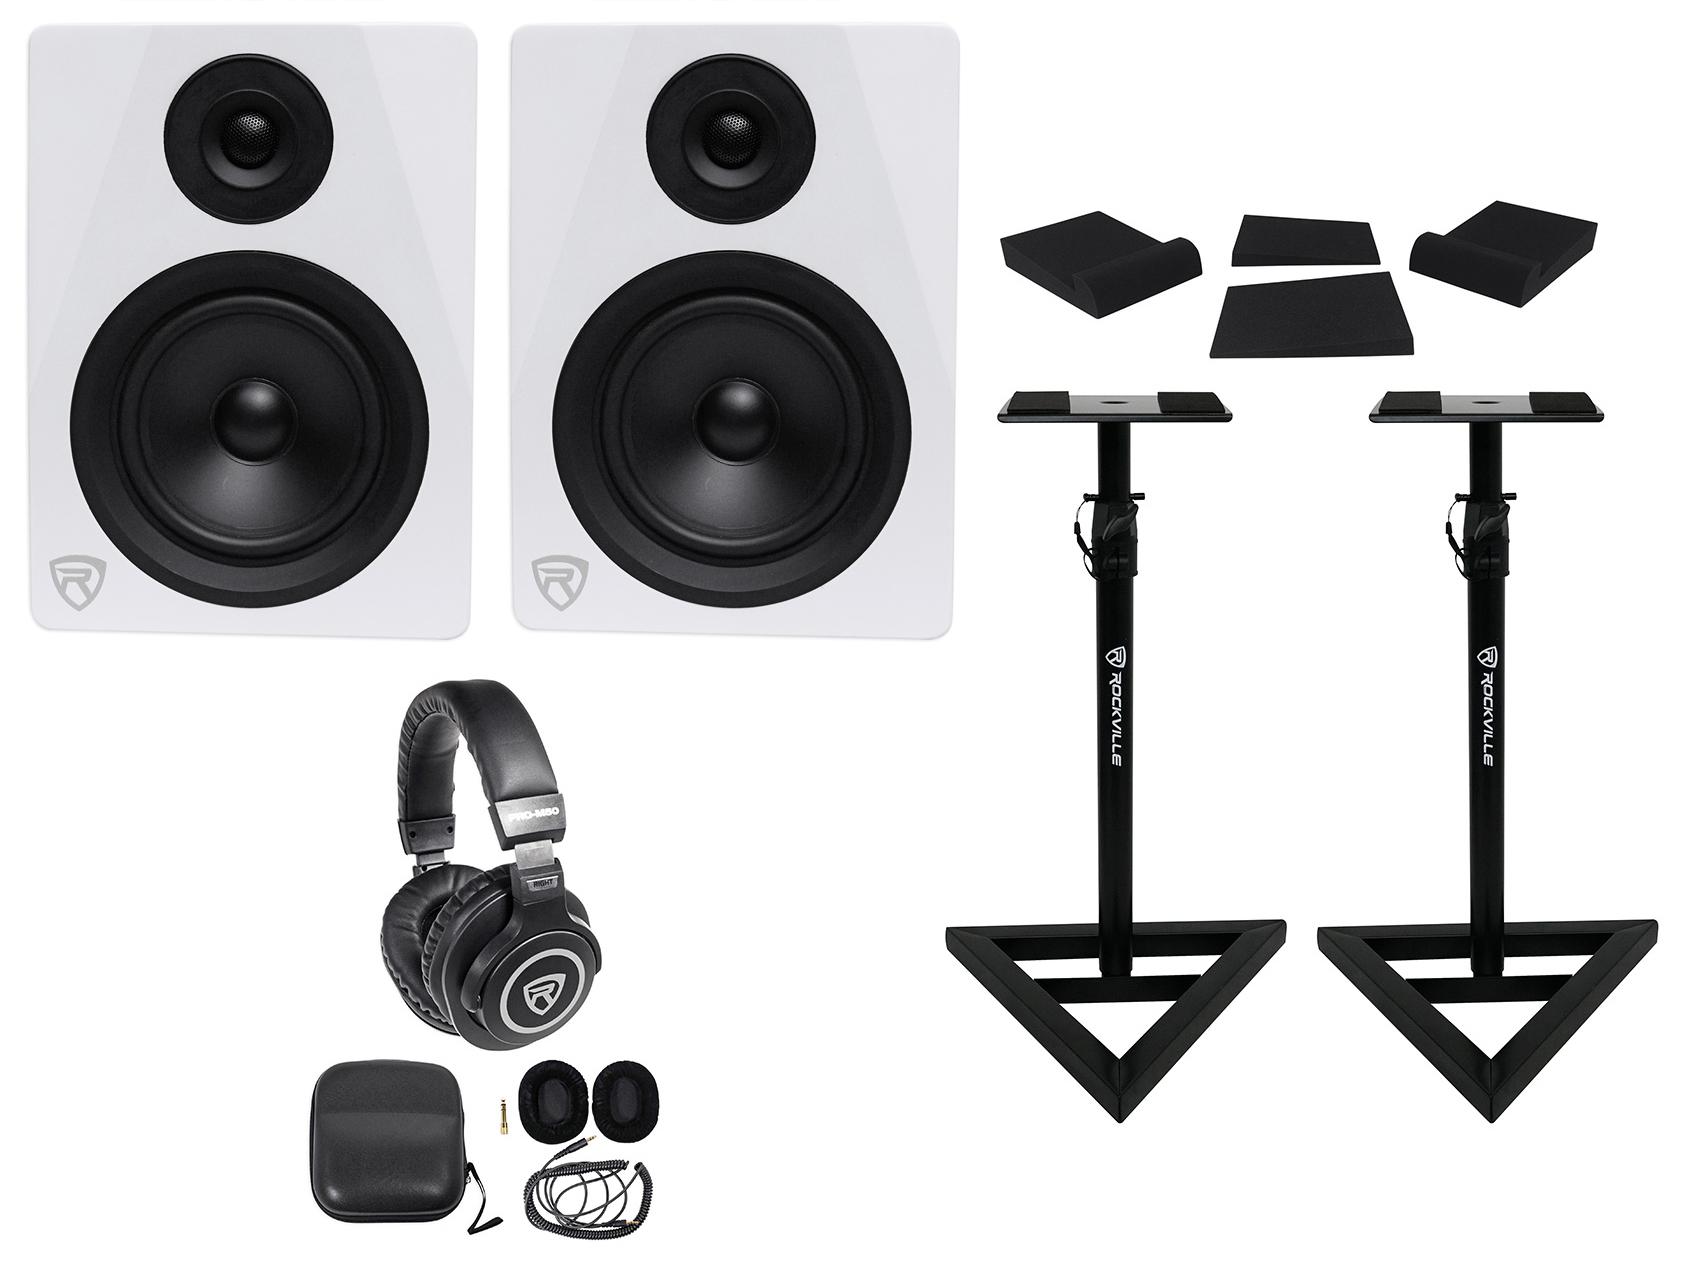 "2 Rockville DPM5W 5.25"" 300w Dual Powered Studio Monitors+Stands+Pads+Headphones by ROCKVILLE"